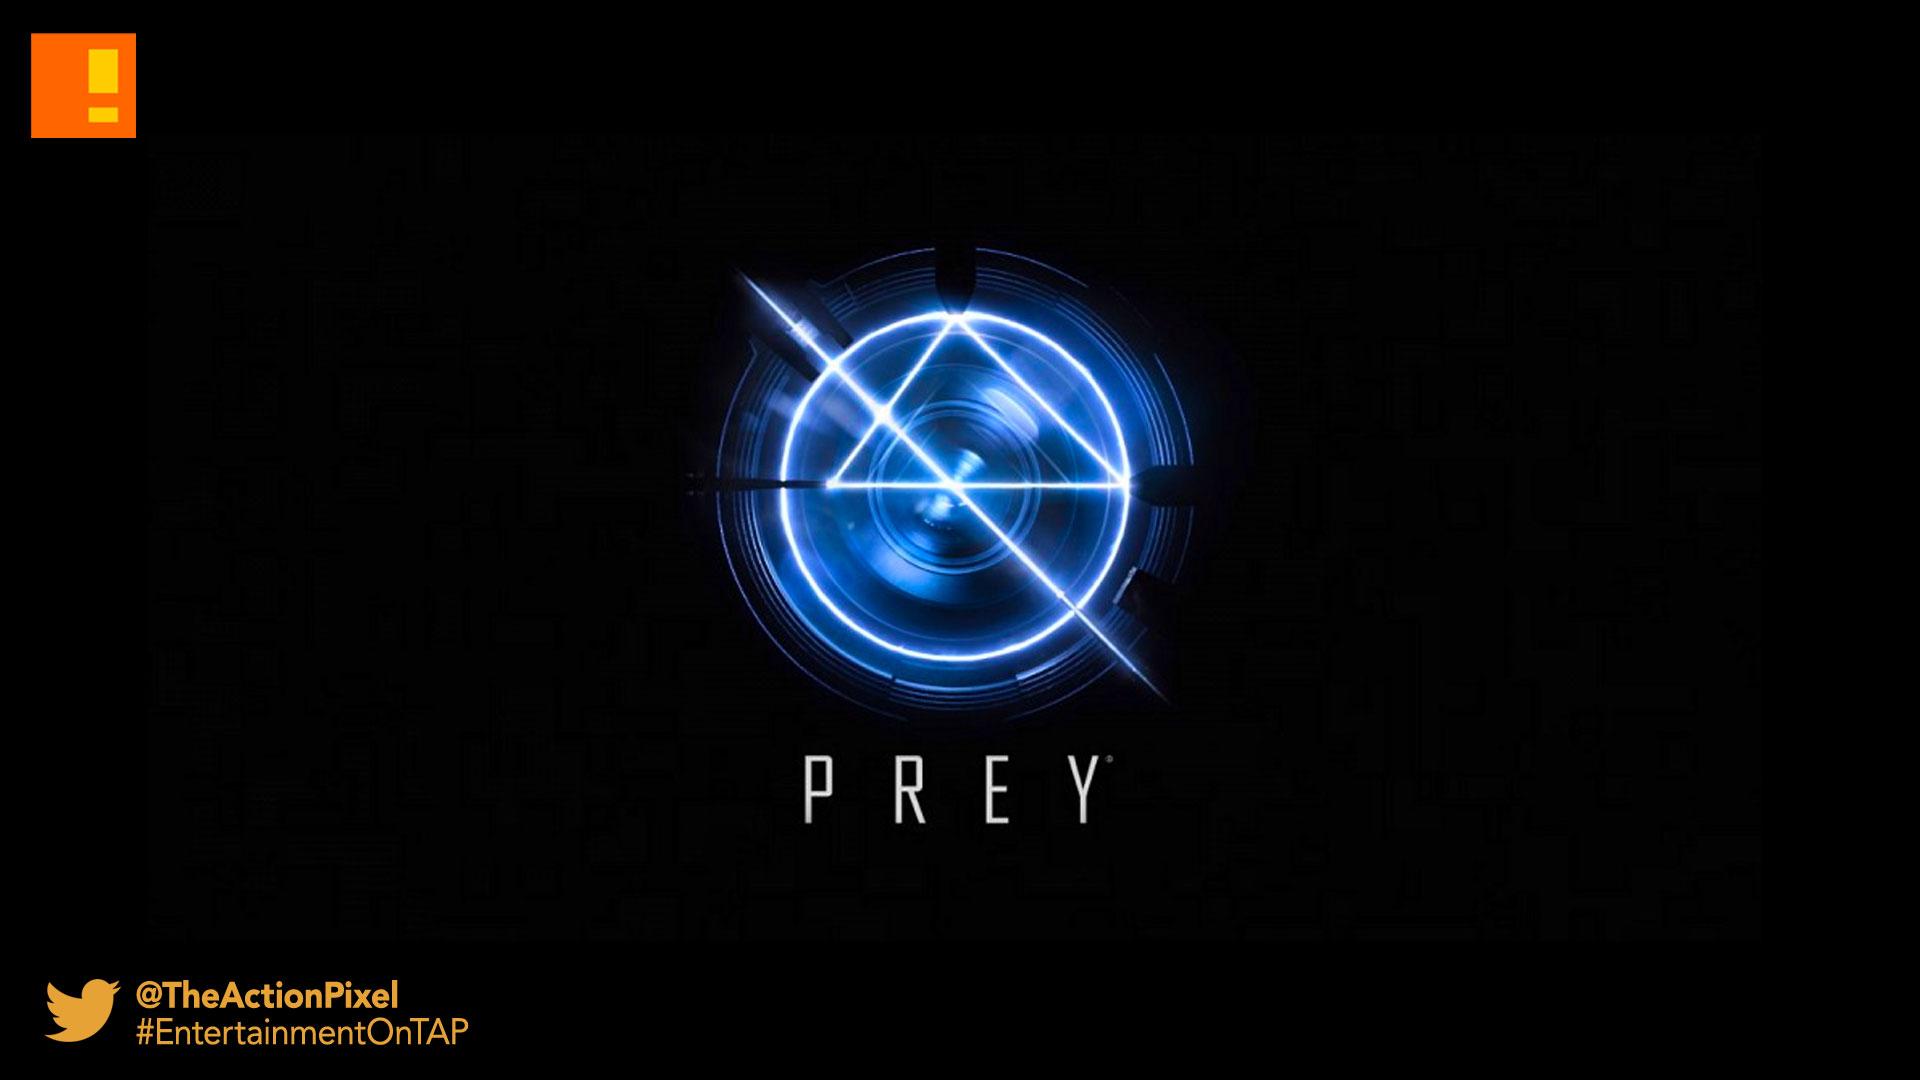 prey, bethesda game studios, bethesda, bethesda softworks, entertainment on tap, the action pixel, #entertainmentontap, @theactionpixel